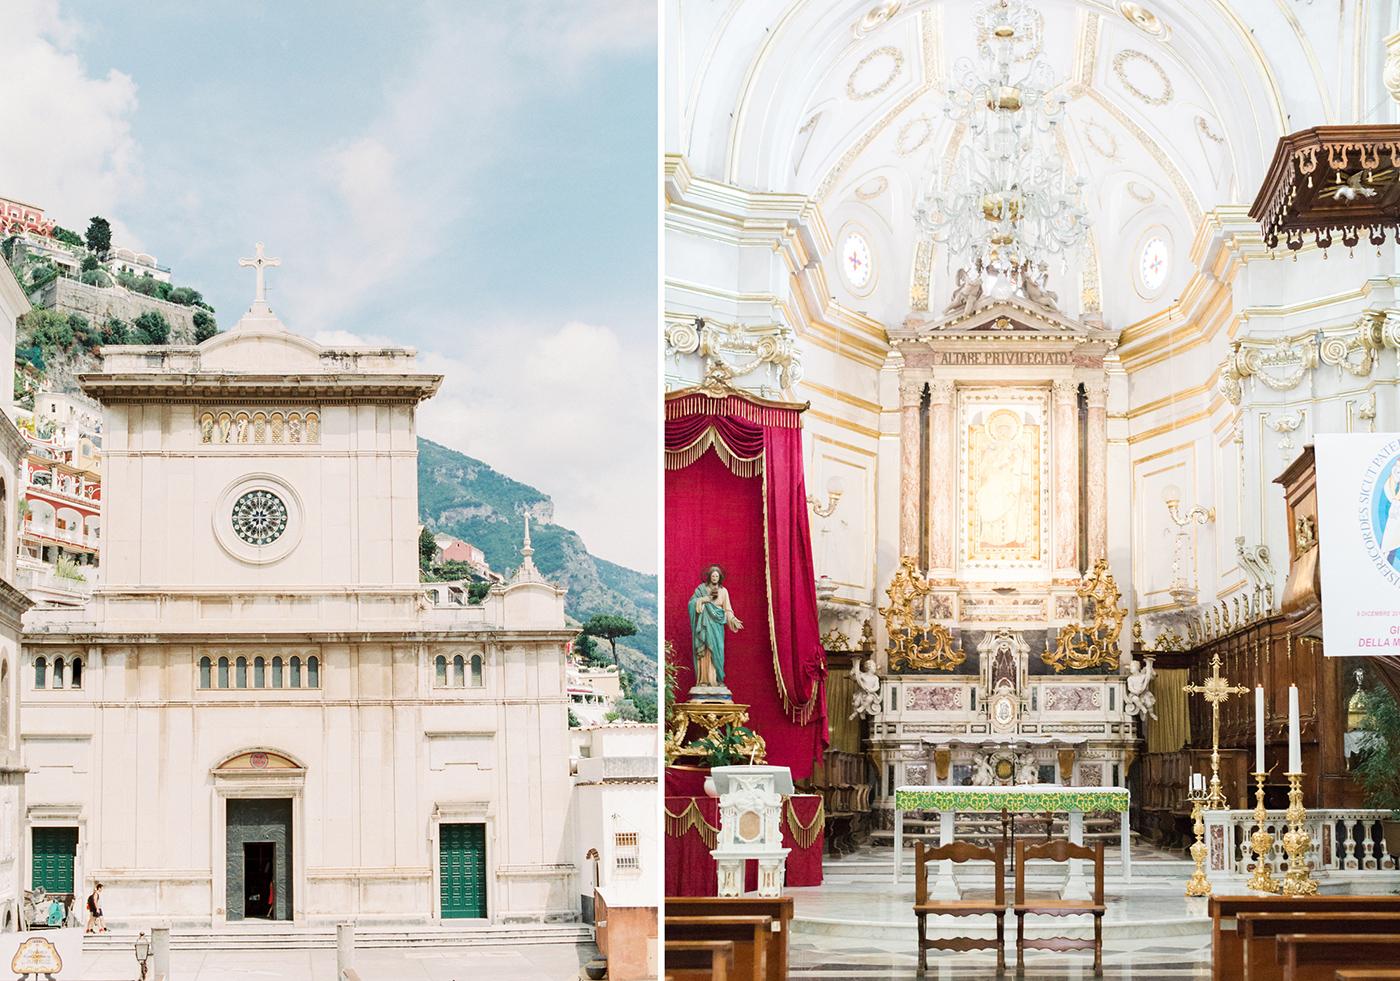 Chiesa di Santa Maria Assunta Positano, Italy